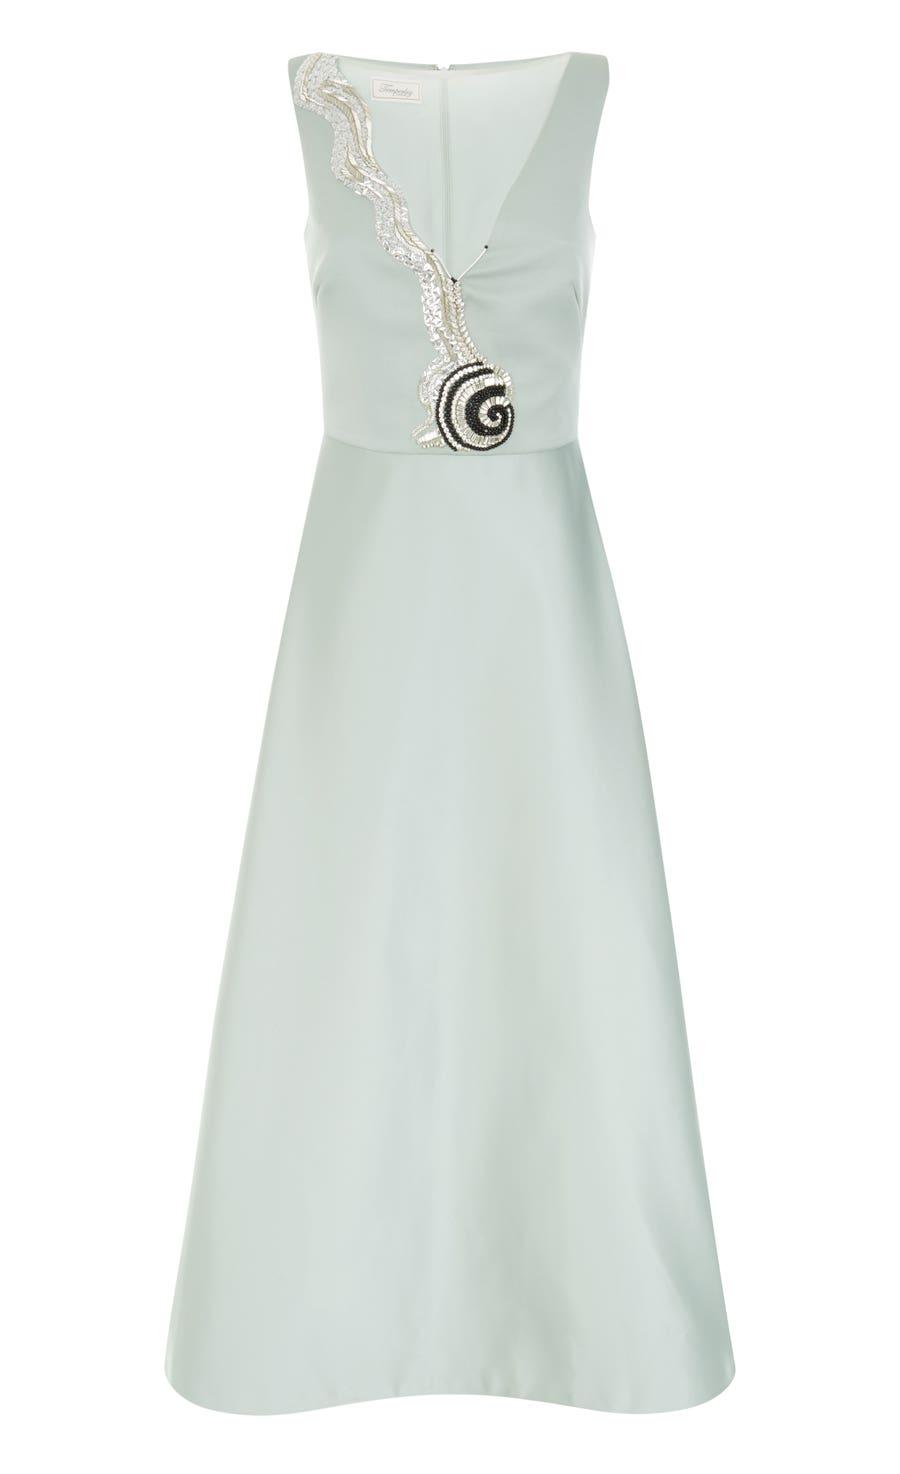 Waterlily Midi Dress, Duck Egg